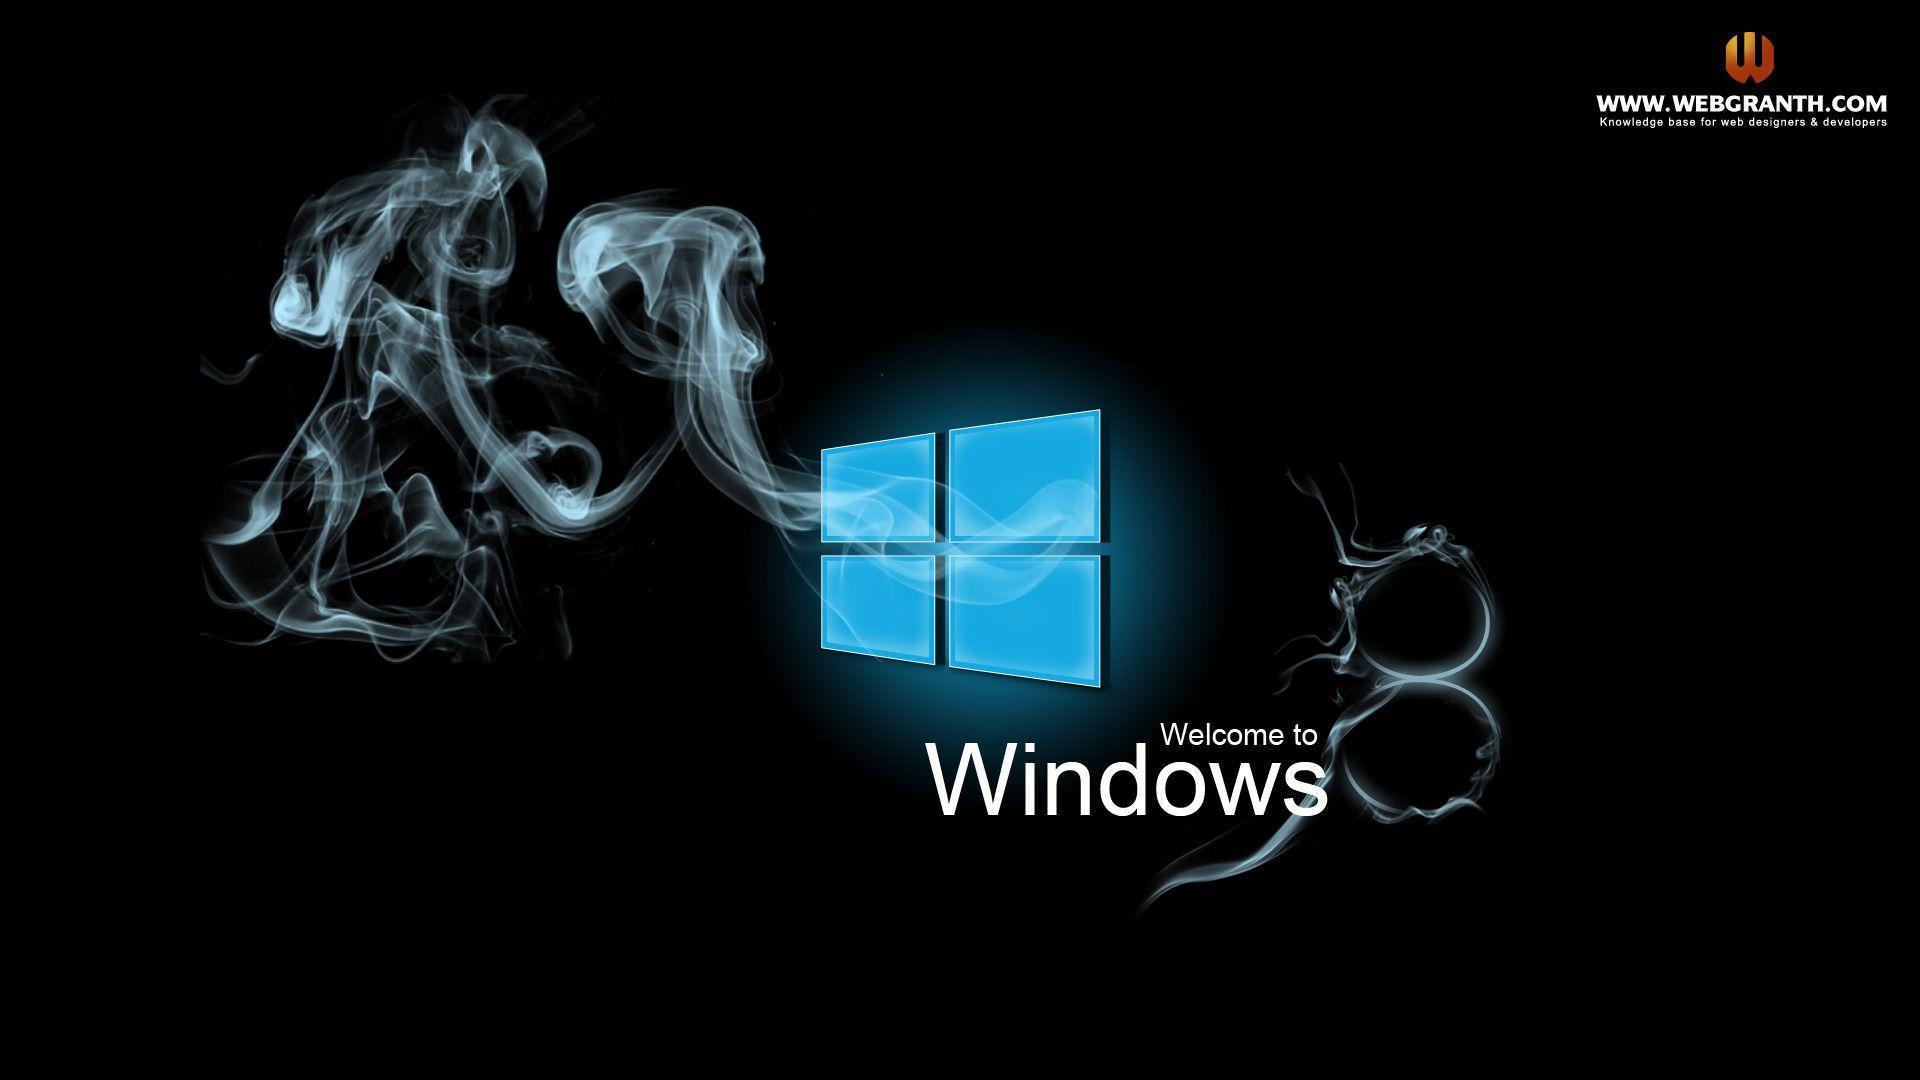 Free Windows 8 Wallpaper Backgrounds Webgranth